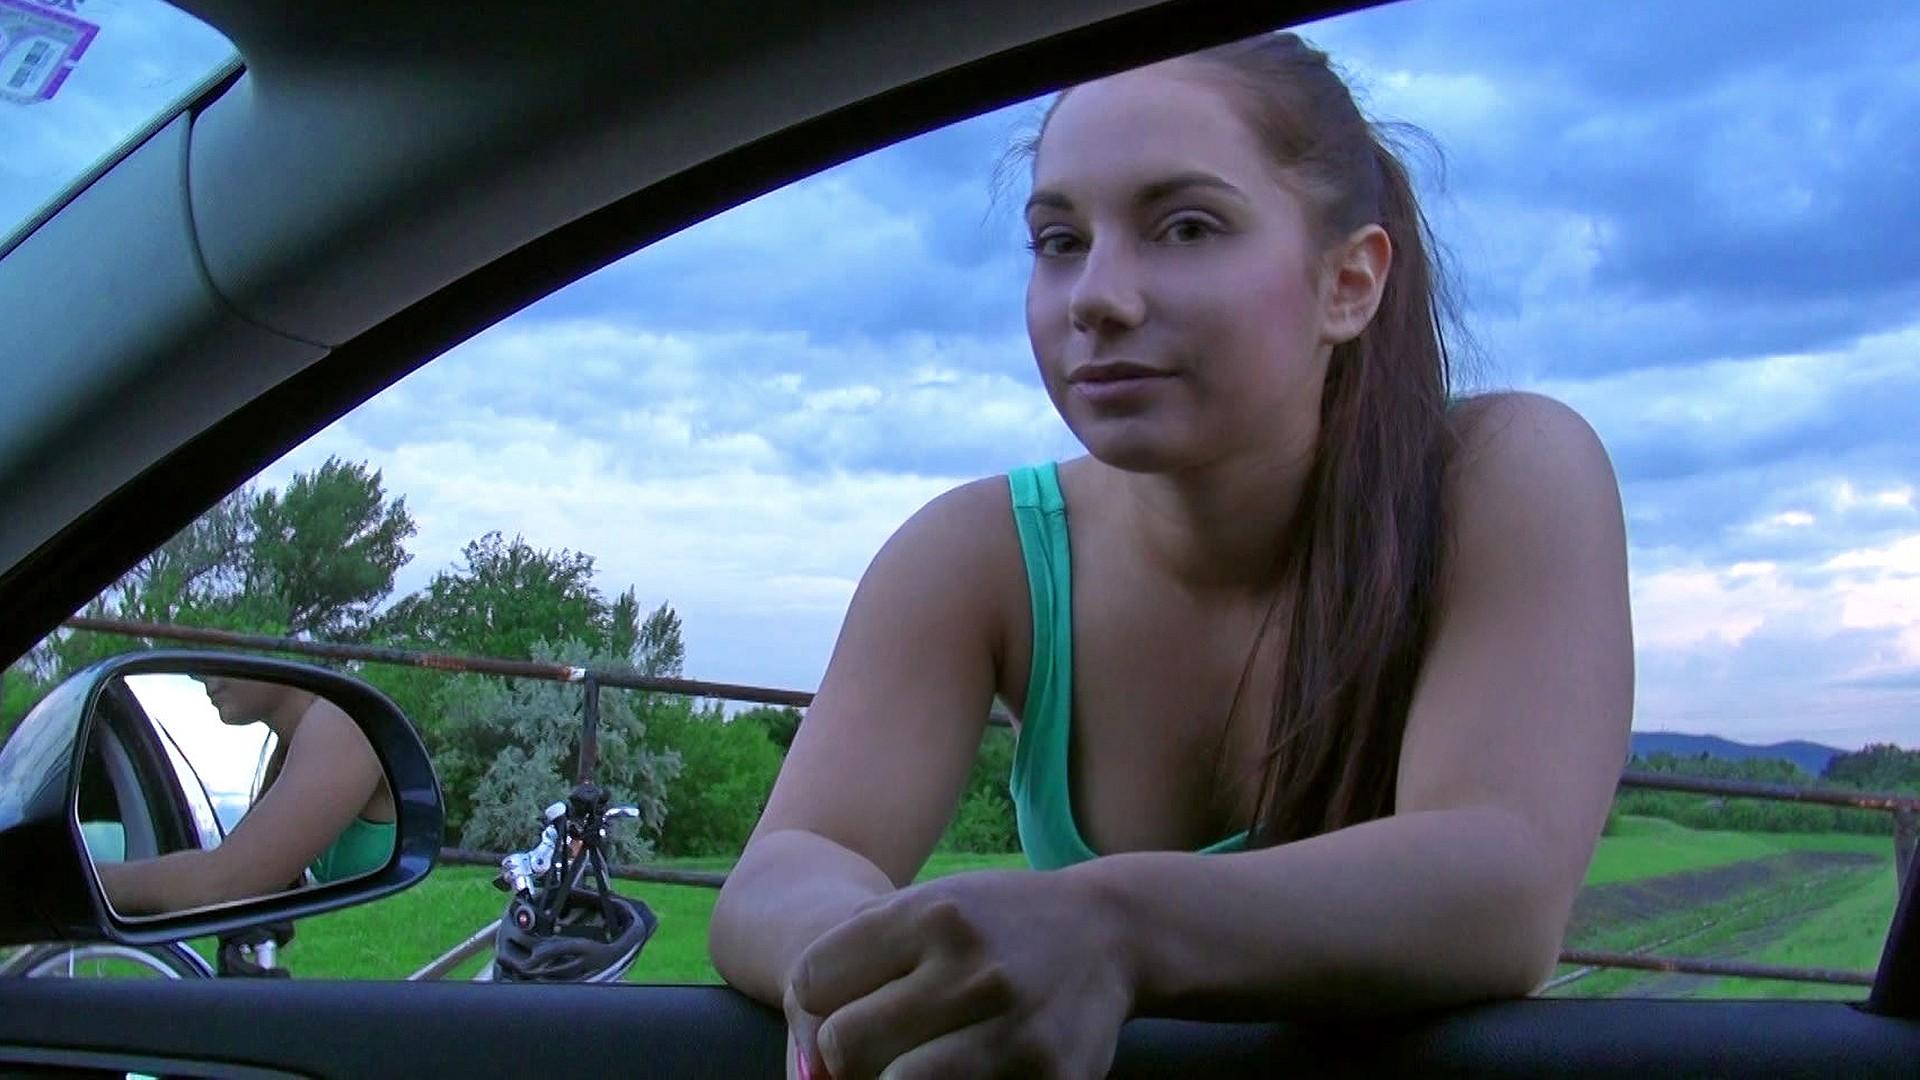 Driving Blowjob Amateur Girl - Stranded Teens